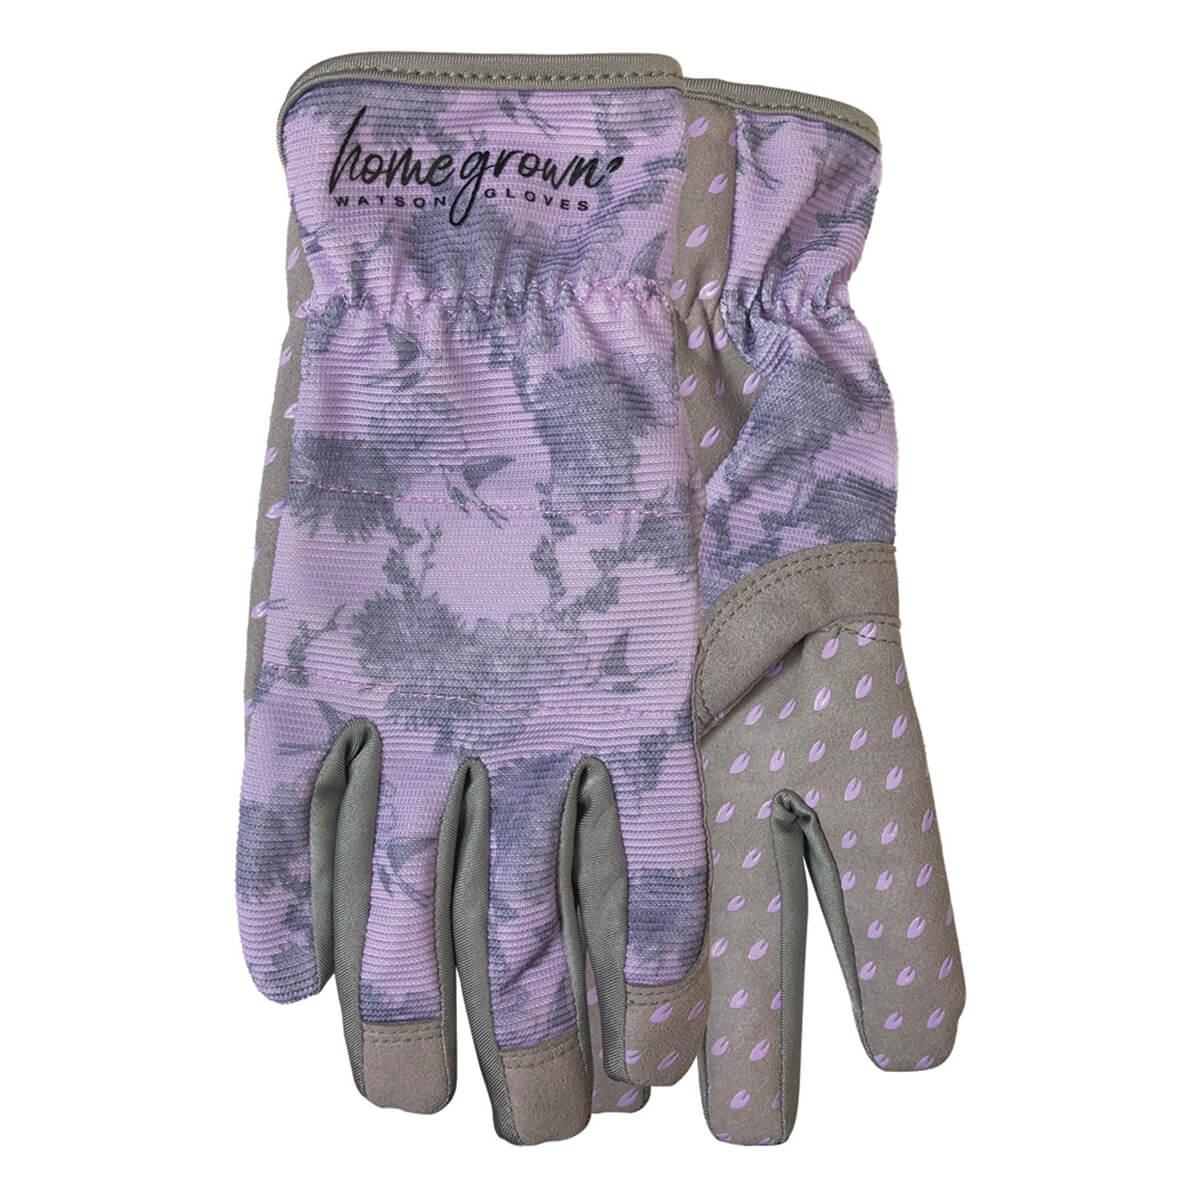 Sparrow Gloves - M